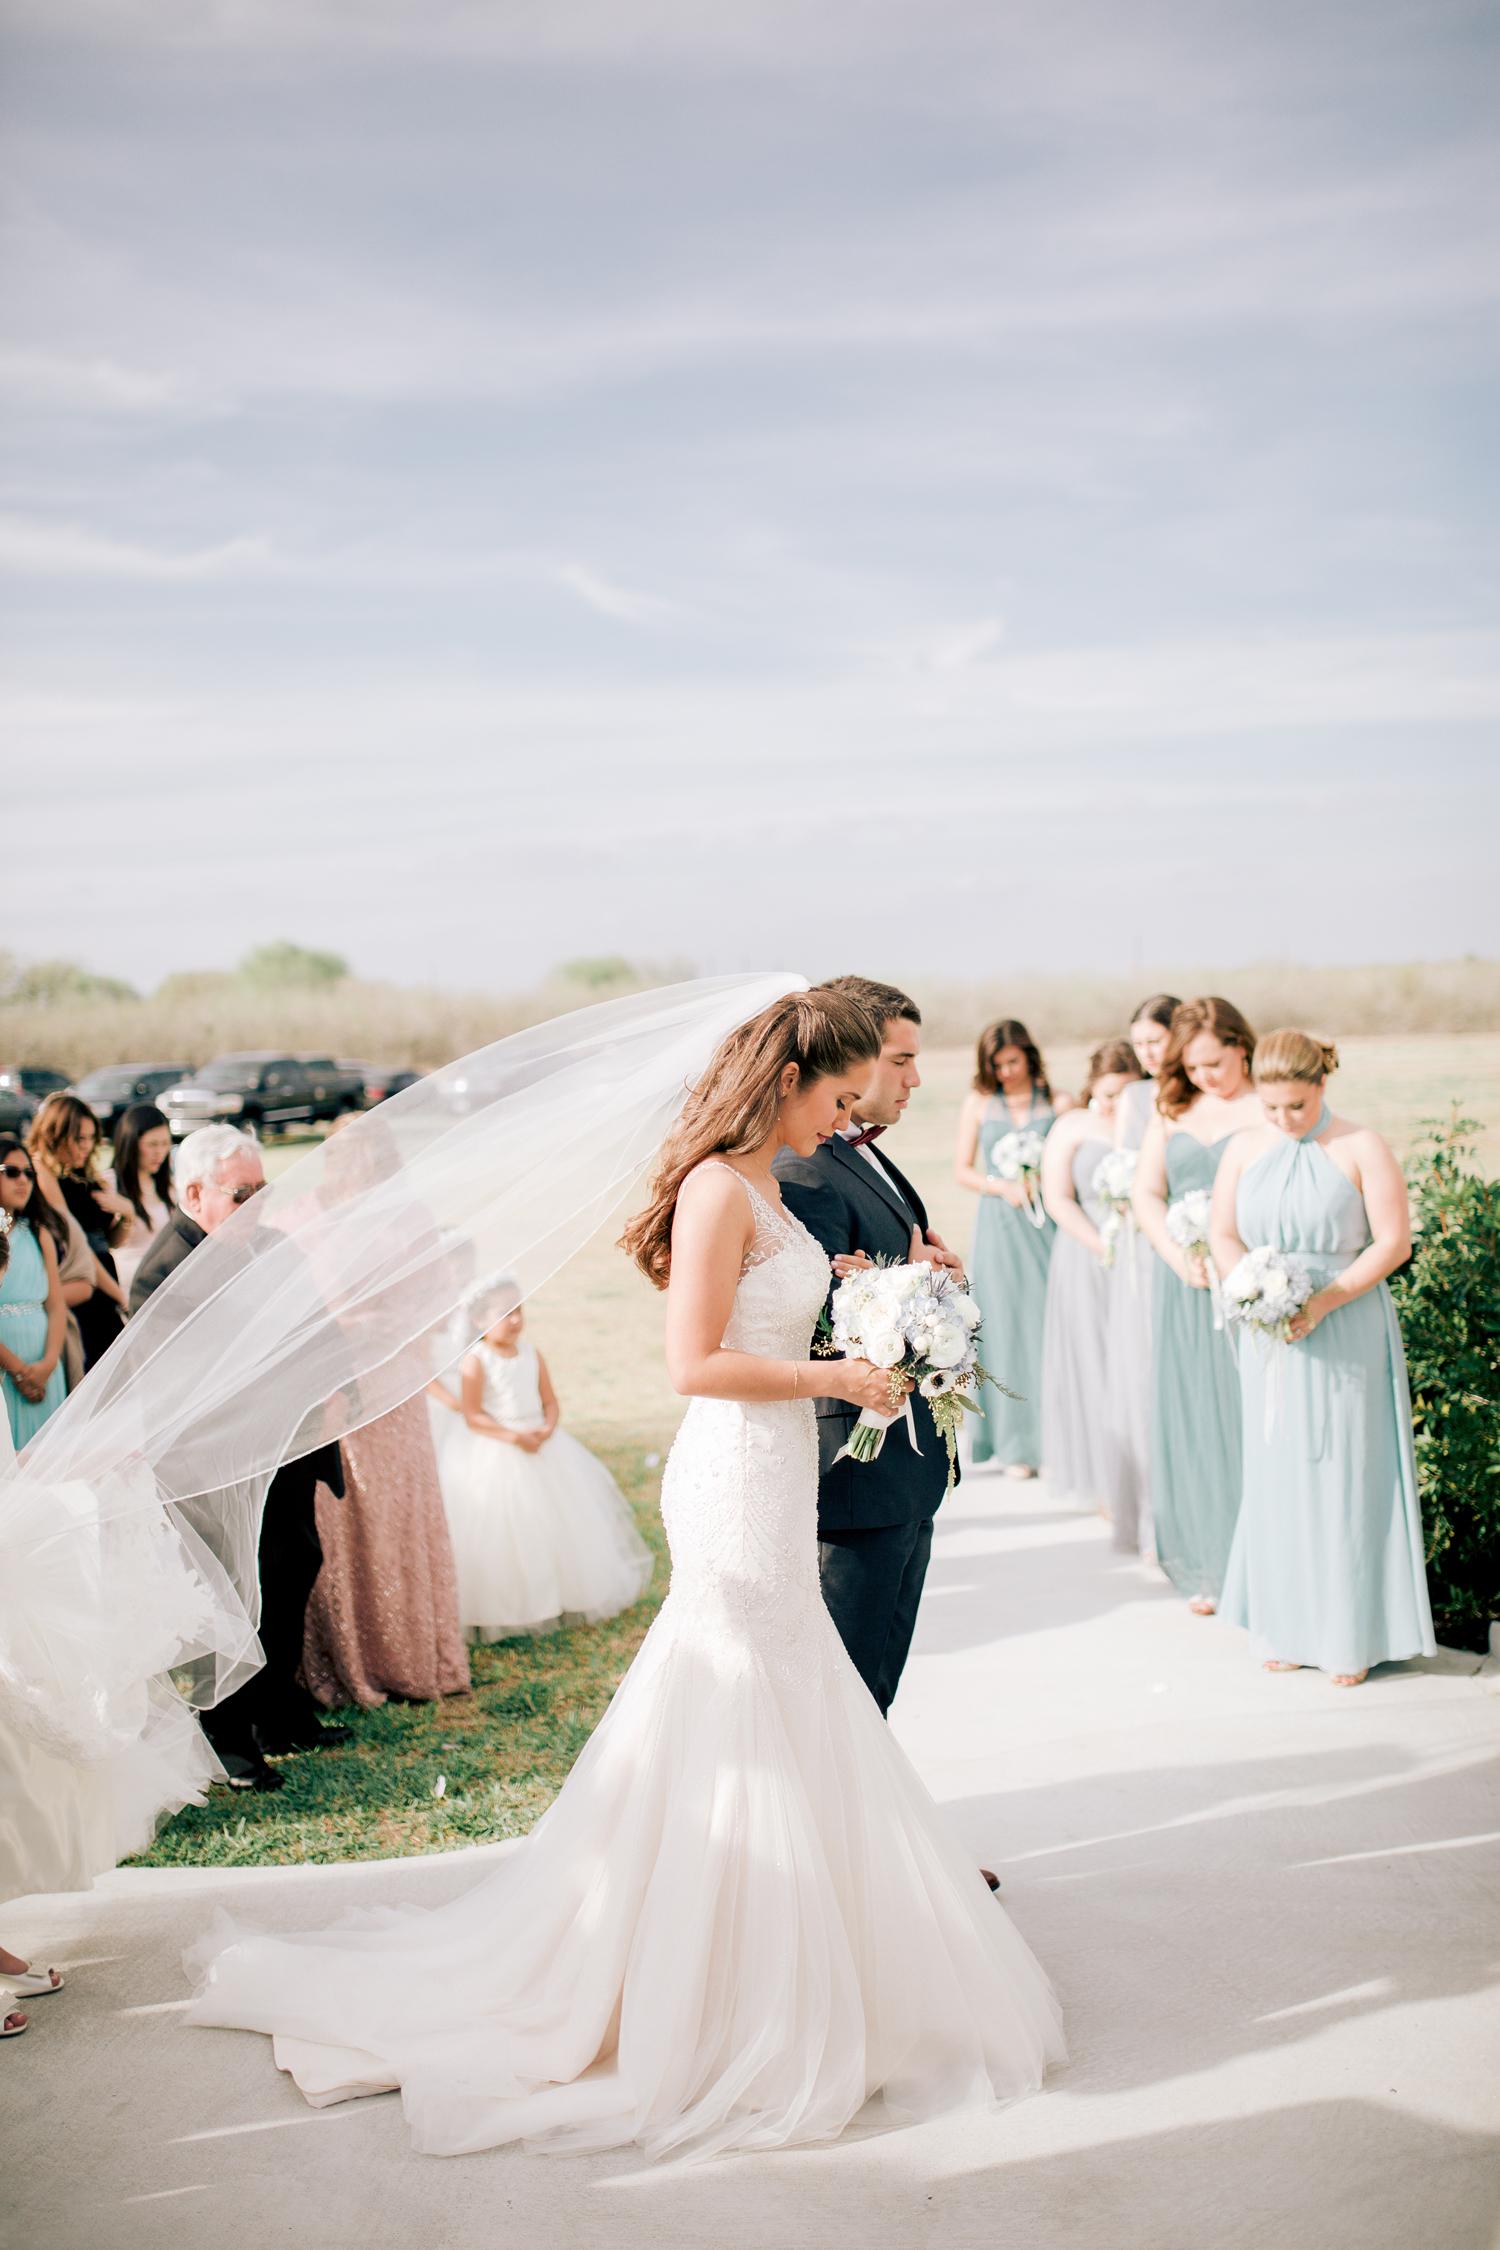 alaa-marzouk-photography-rgvweddingphotographer-rio-grande-valley-mathis-wedding-bridal-bride-san-antonio-portrait-weddings-mcallen-97.jpg